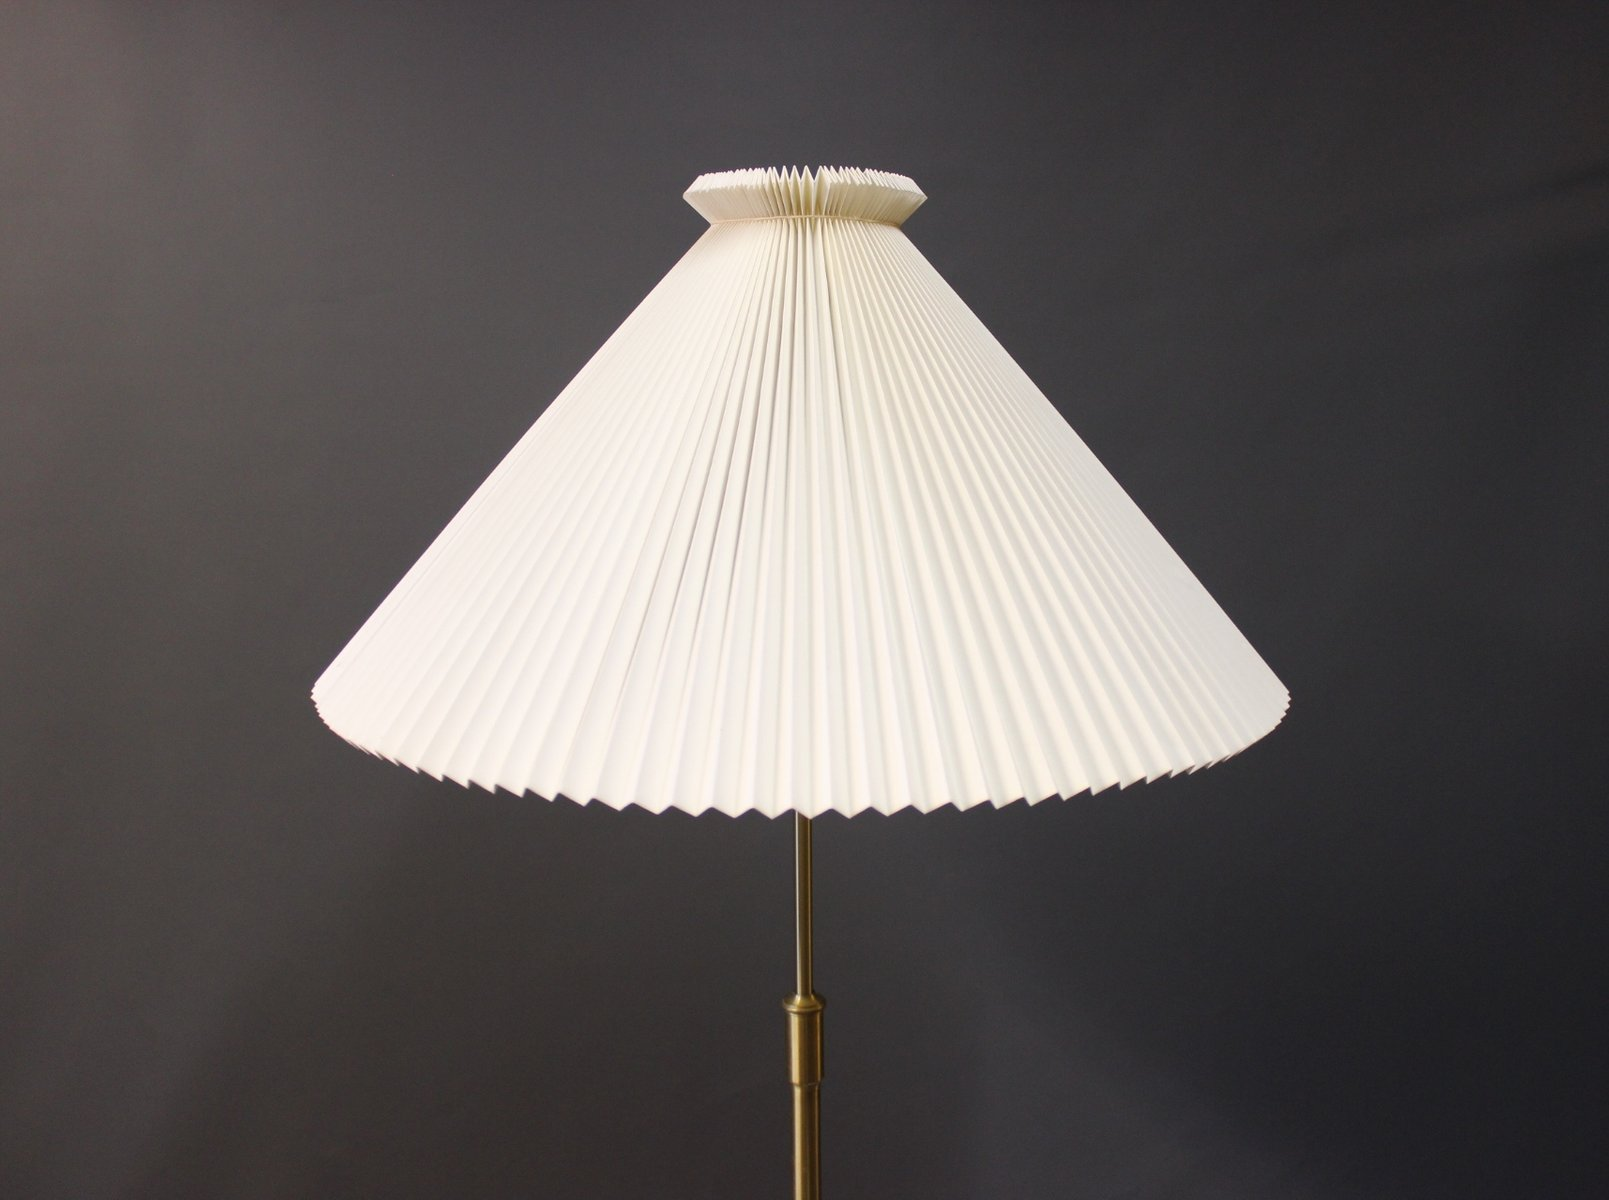 Model 351 Floor Lamp by Aage Petersen for Le Klint 1980s for sale